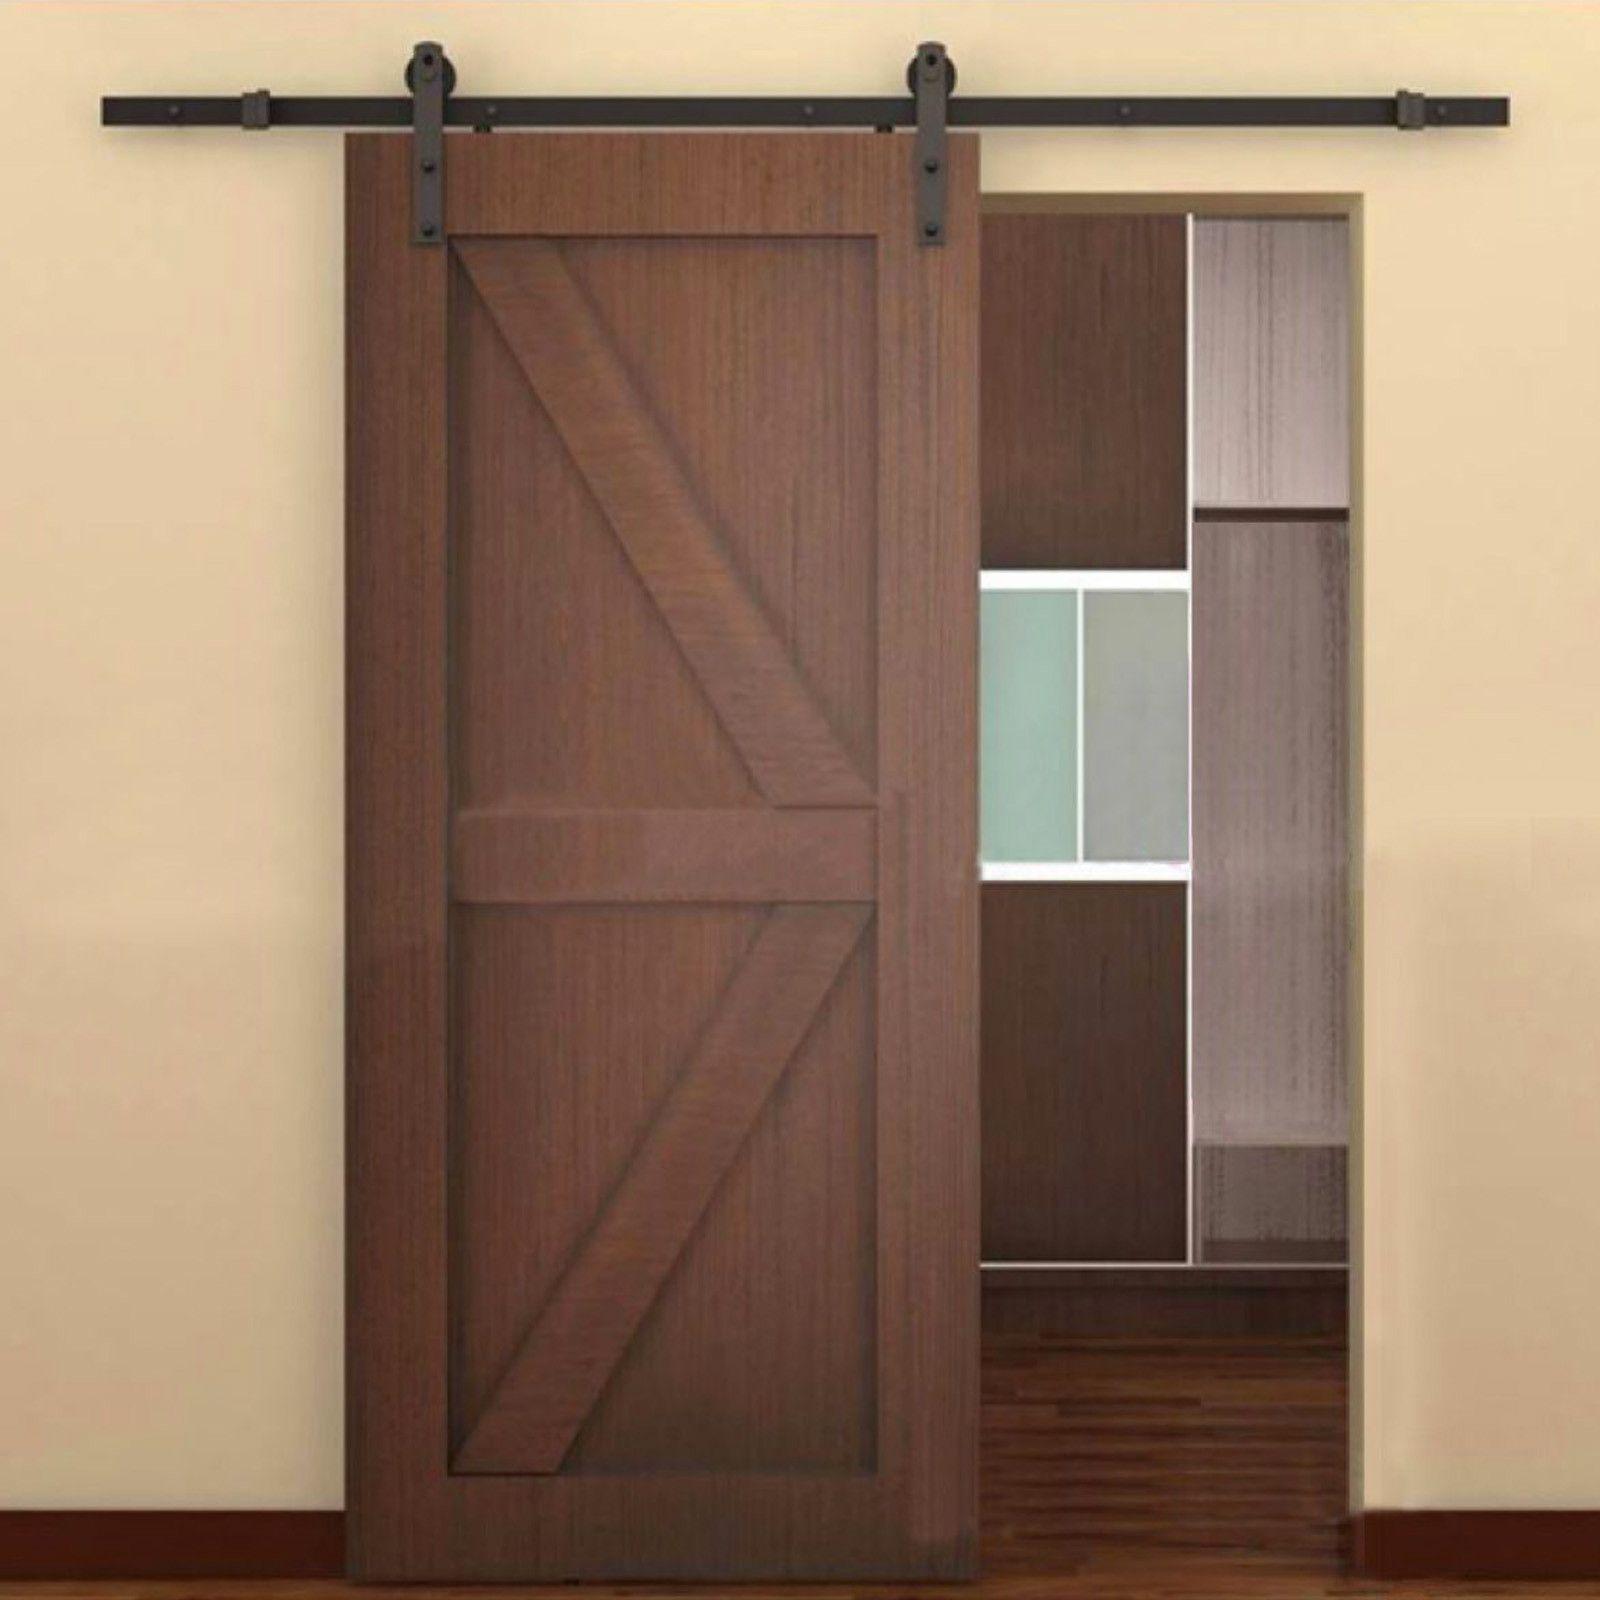 Hardware for wall mounted sliding door - Sliding Door Track Hardware Set 6 6ft Brown Black Steel Antique European Barn